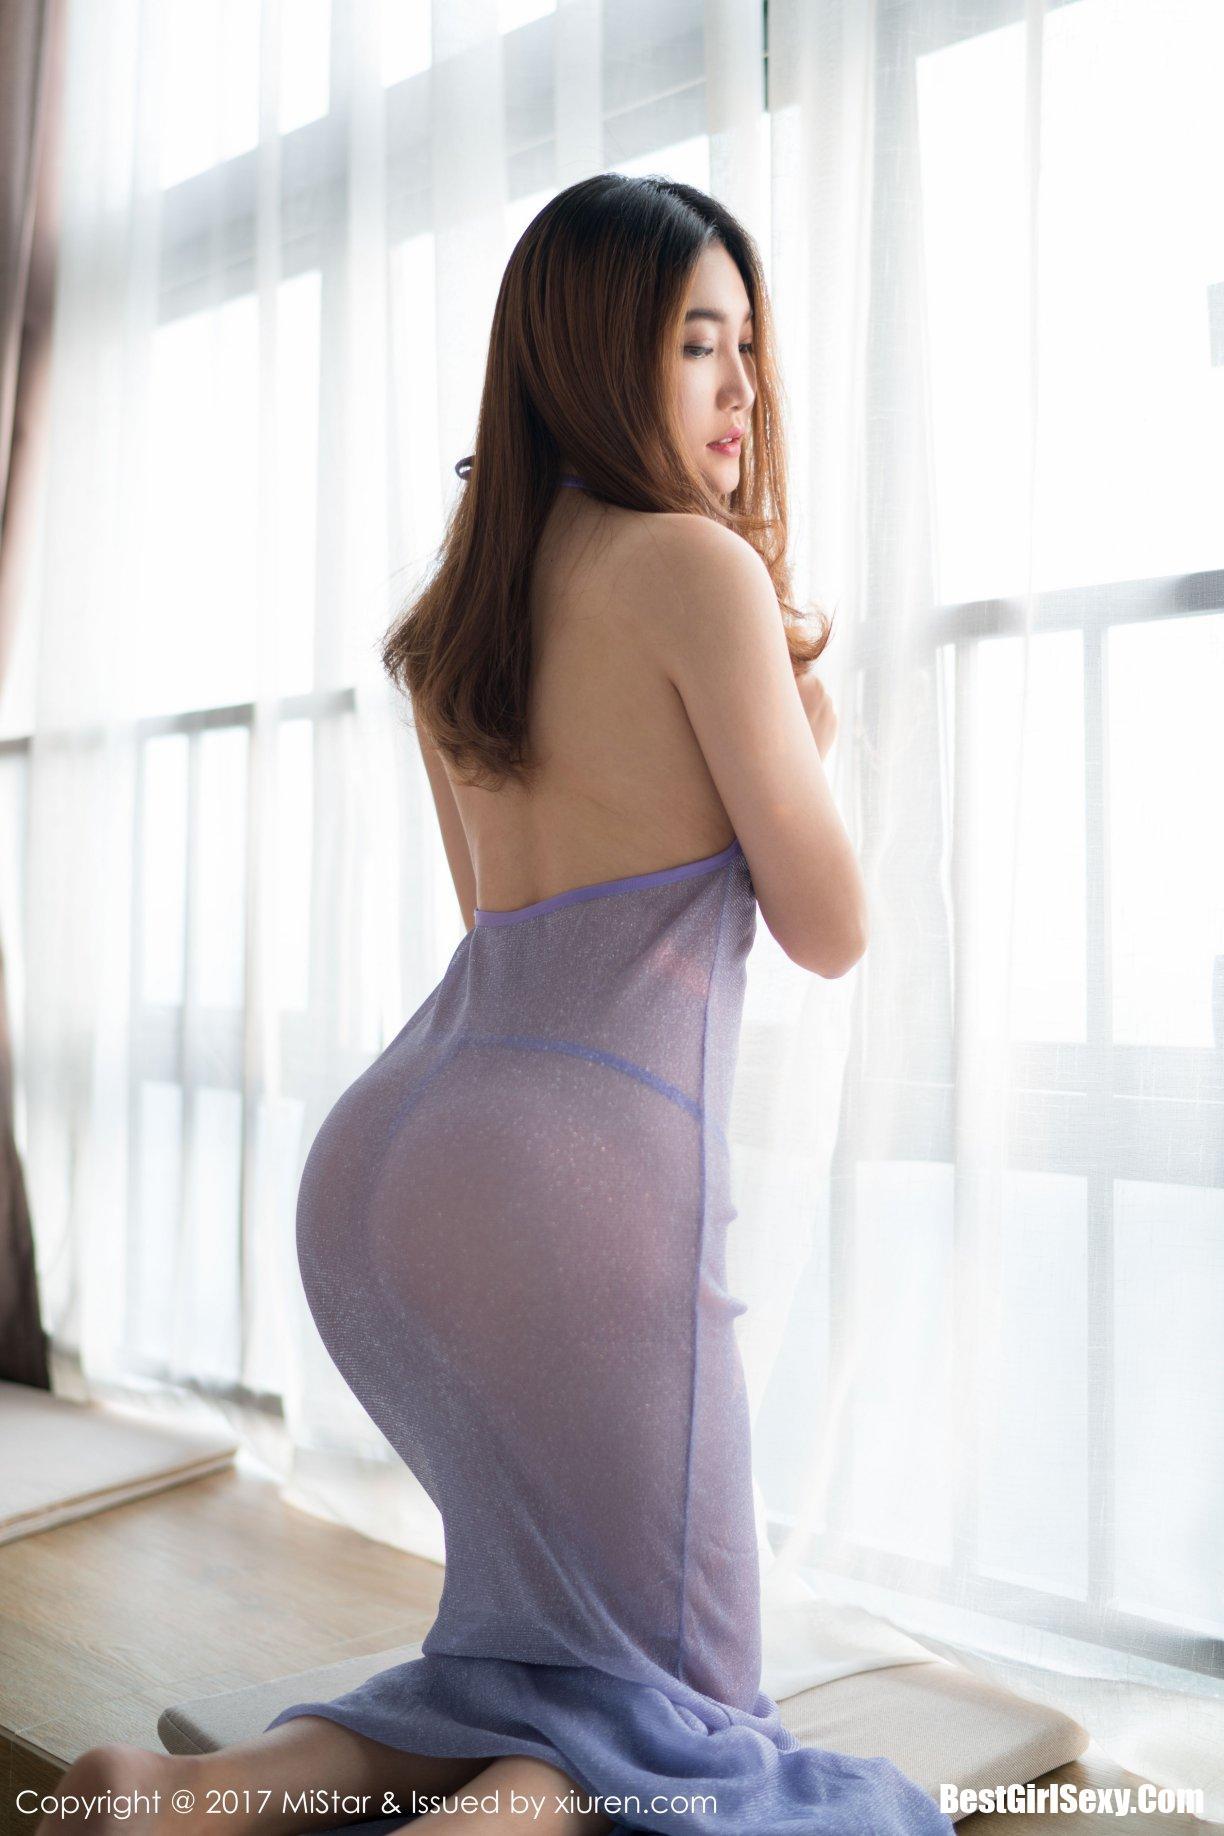 画画Cicy, MiStar魅妍社 Vol.192 Hua Hua Cicy, MiStar魅妍社 Vol.192, Hua Hua Cicy